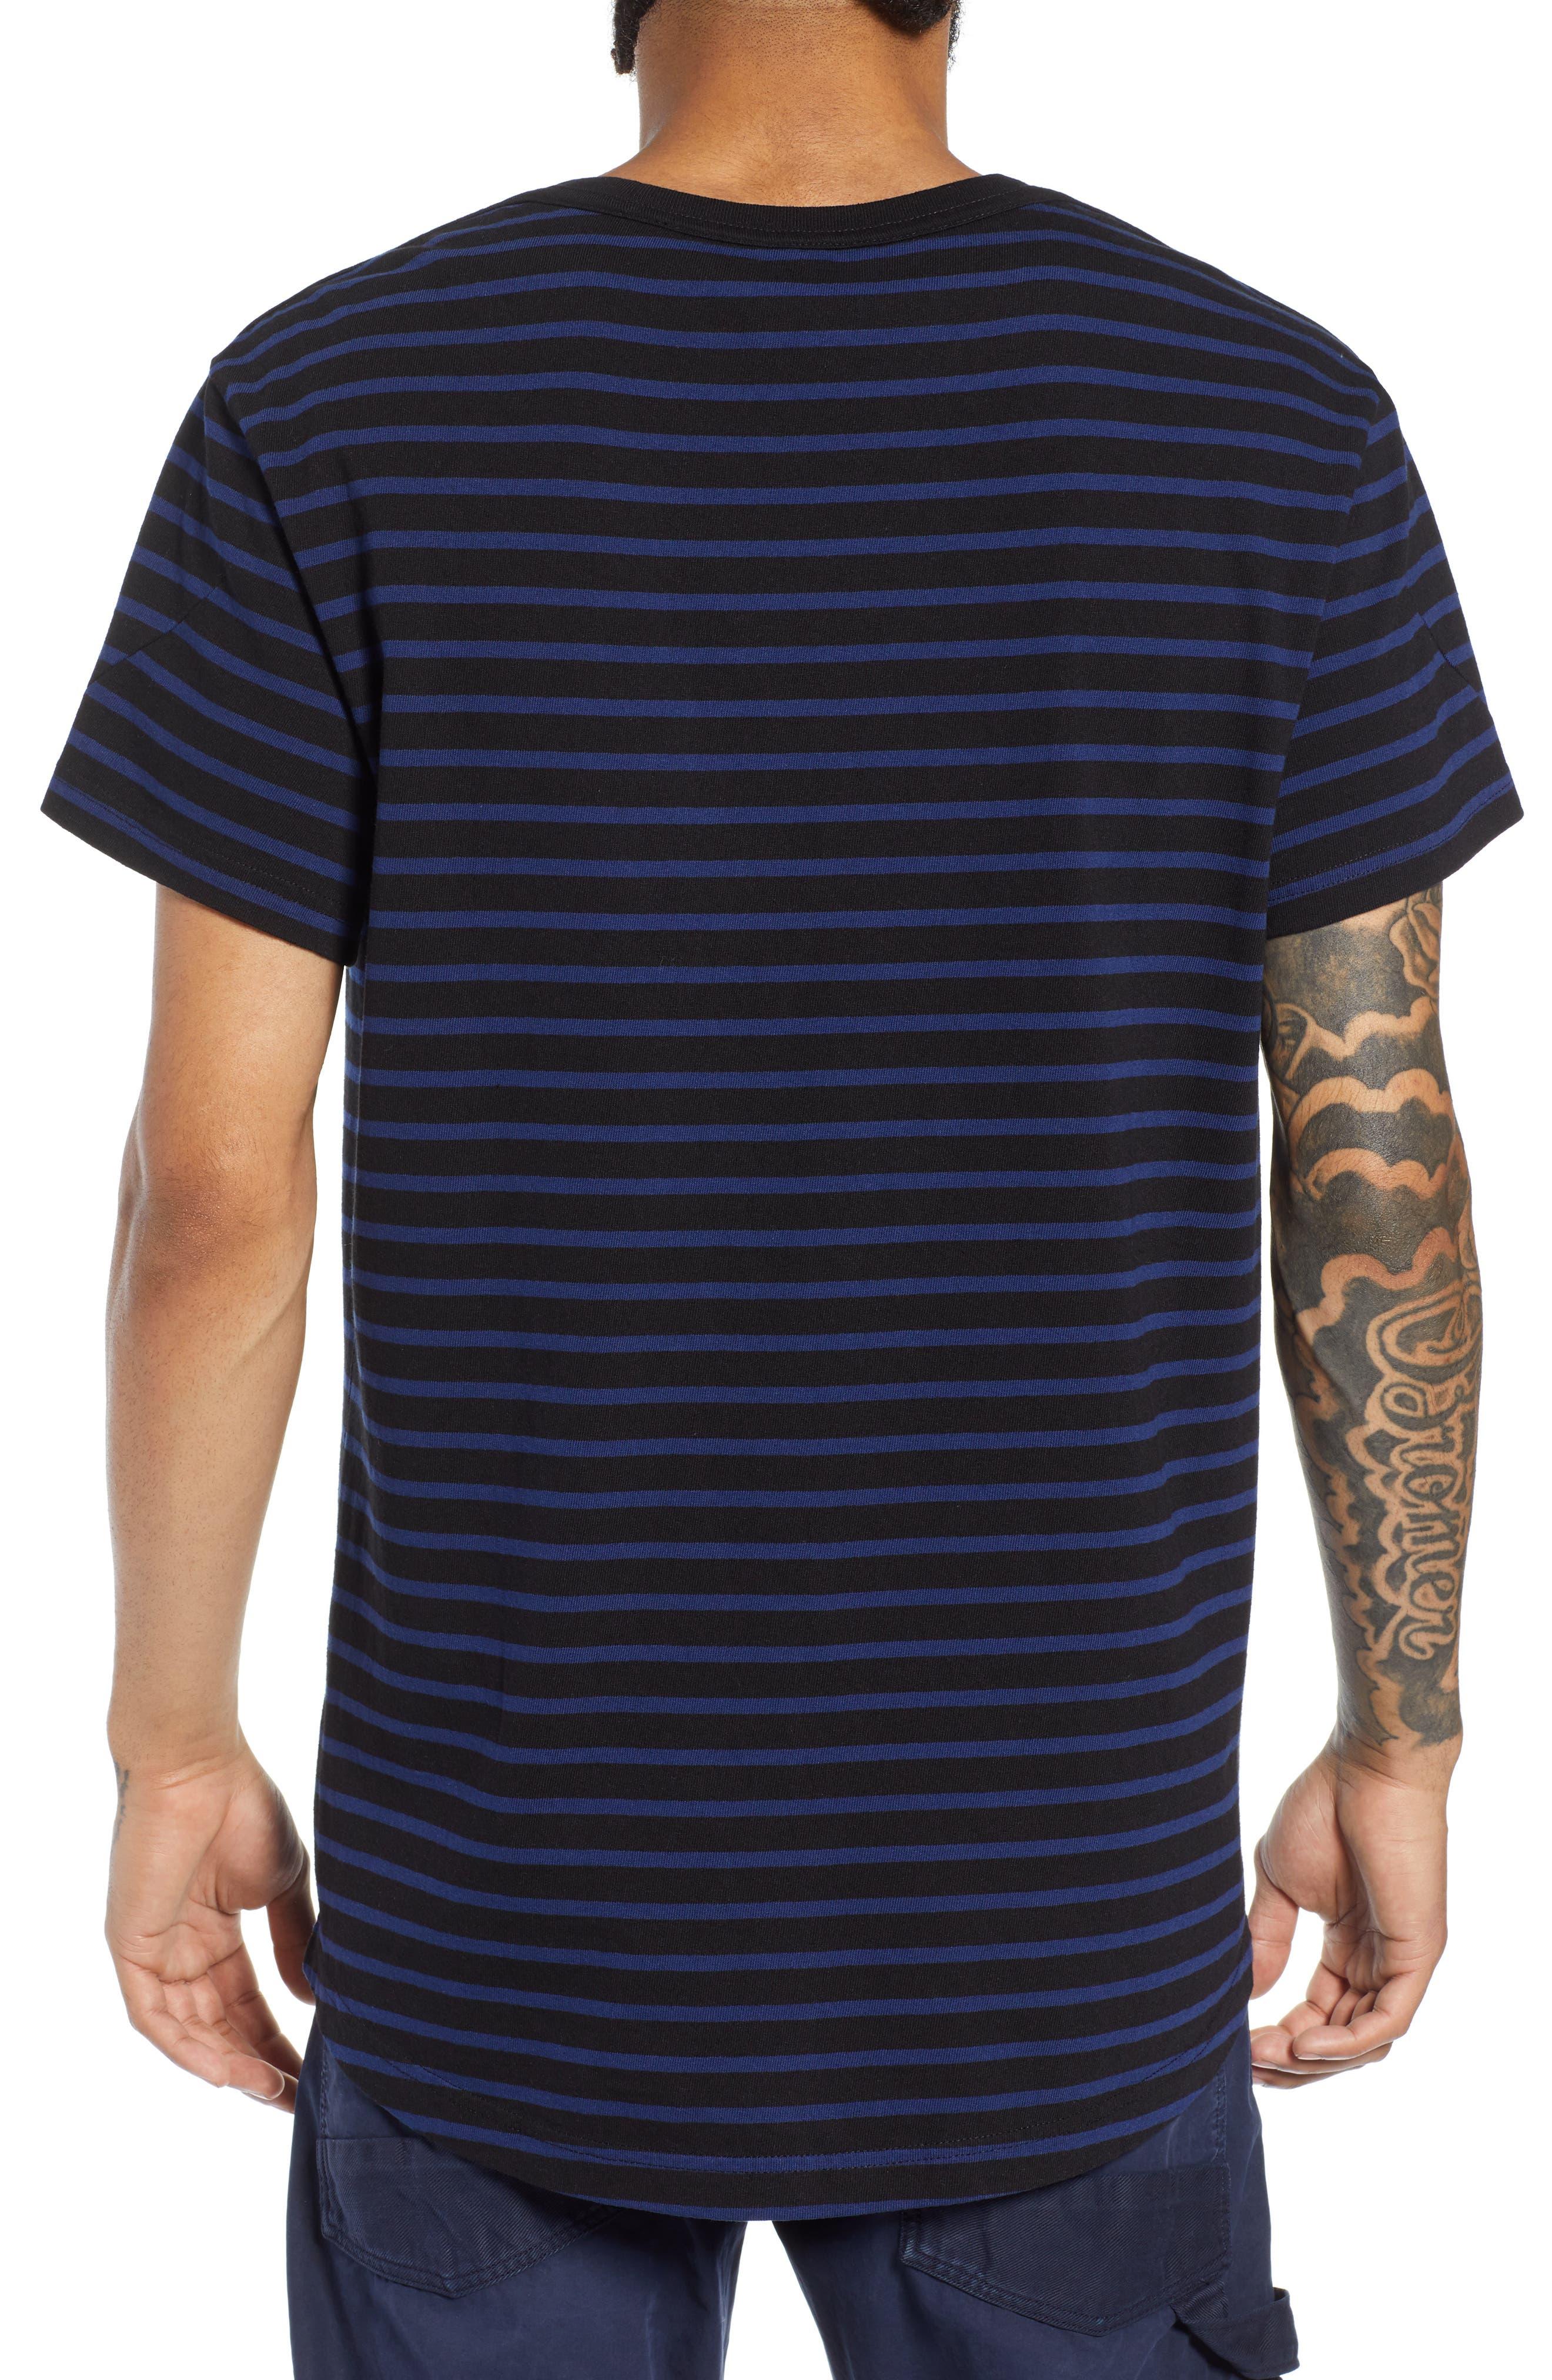 Starkon Stripe T-Shirt,                             Alternate thumbnail 2, color,                             DARK BLACK/ IMPERIAL BLUE